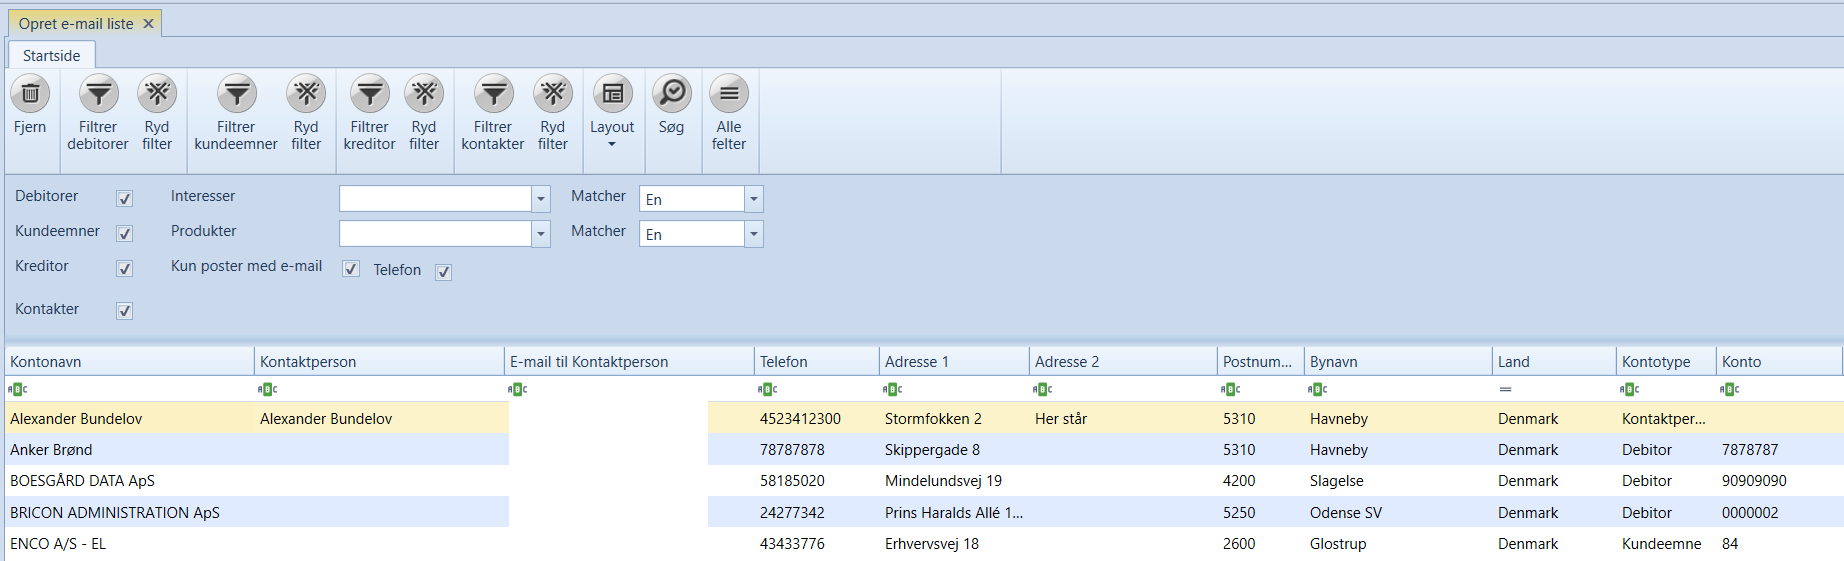 Uniconta | Opret E-mail liste | Uniconta